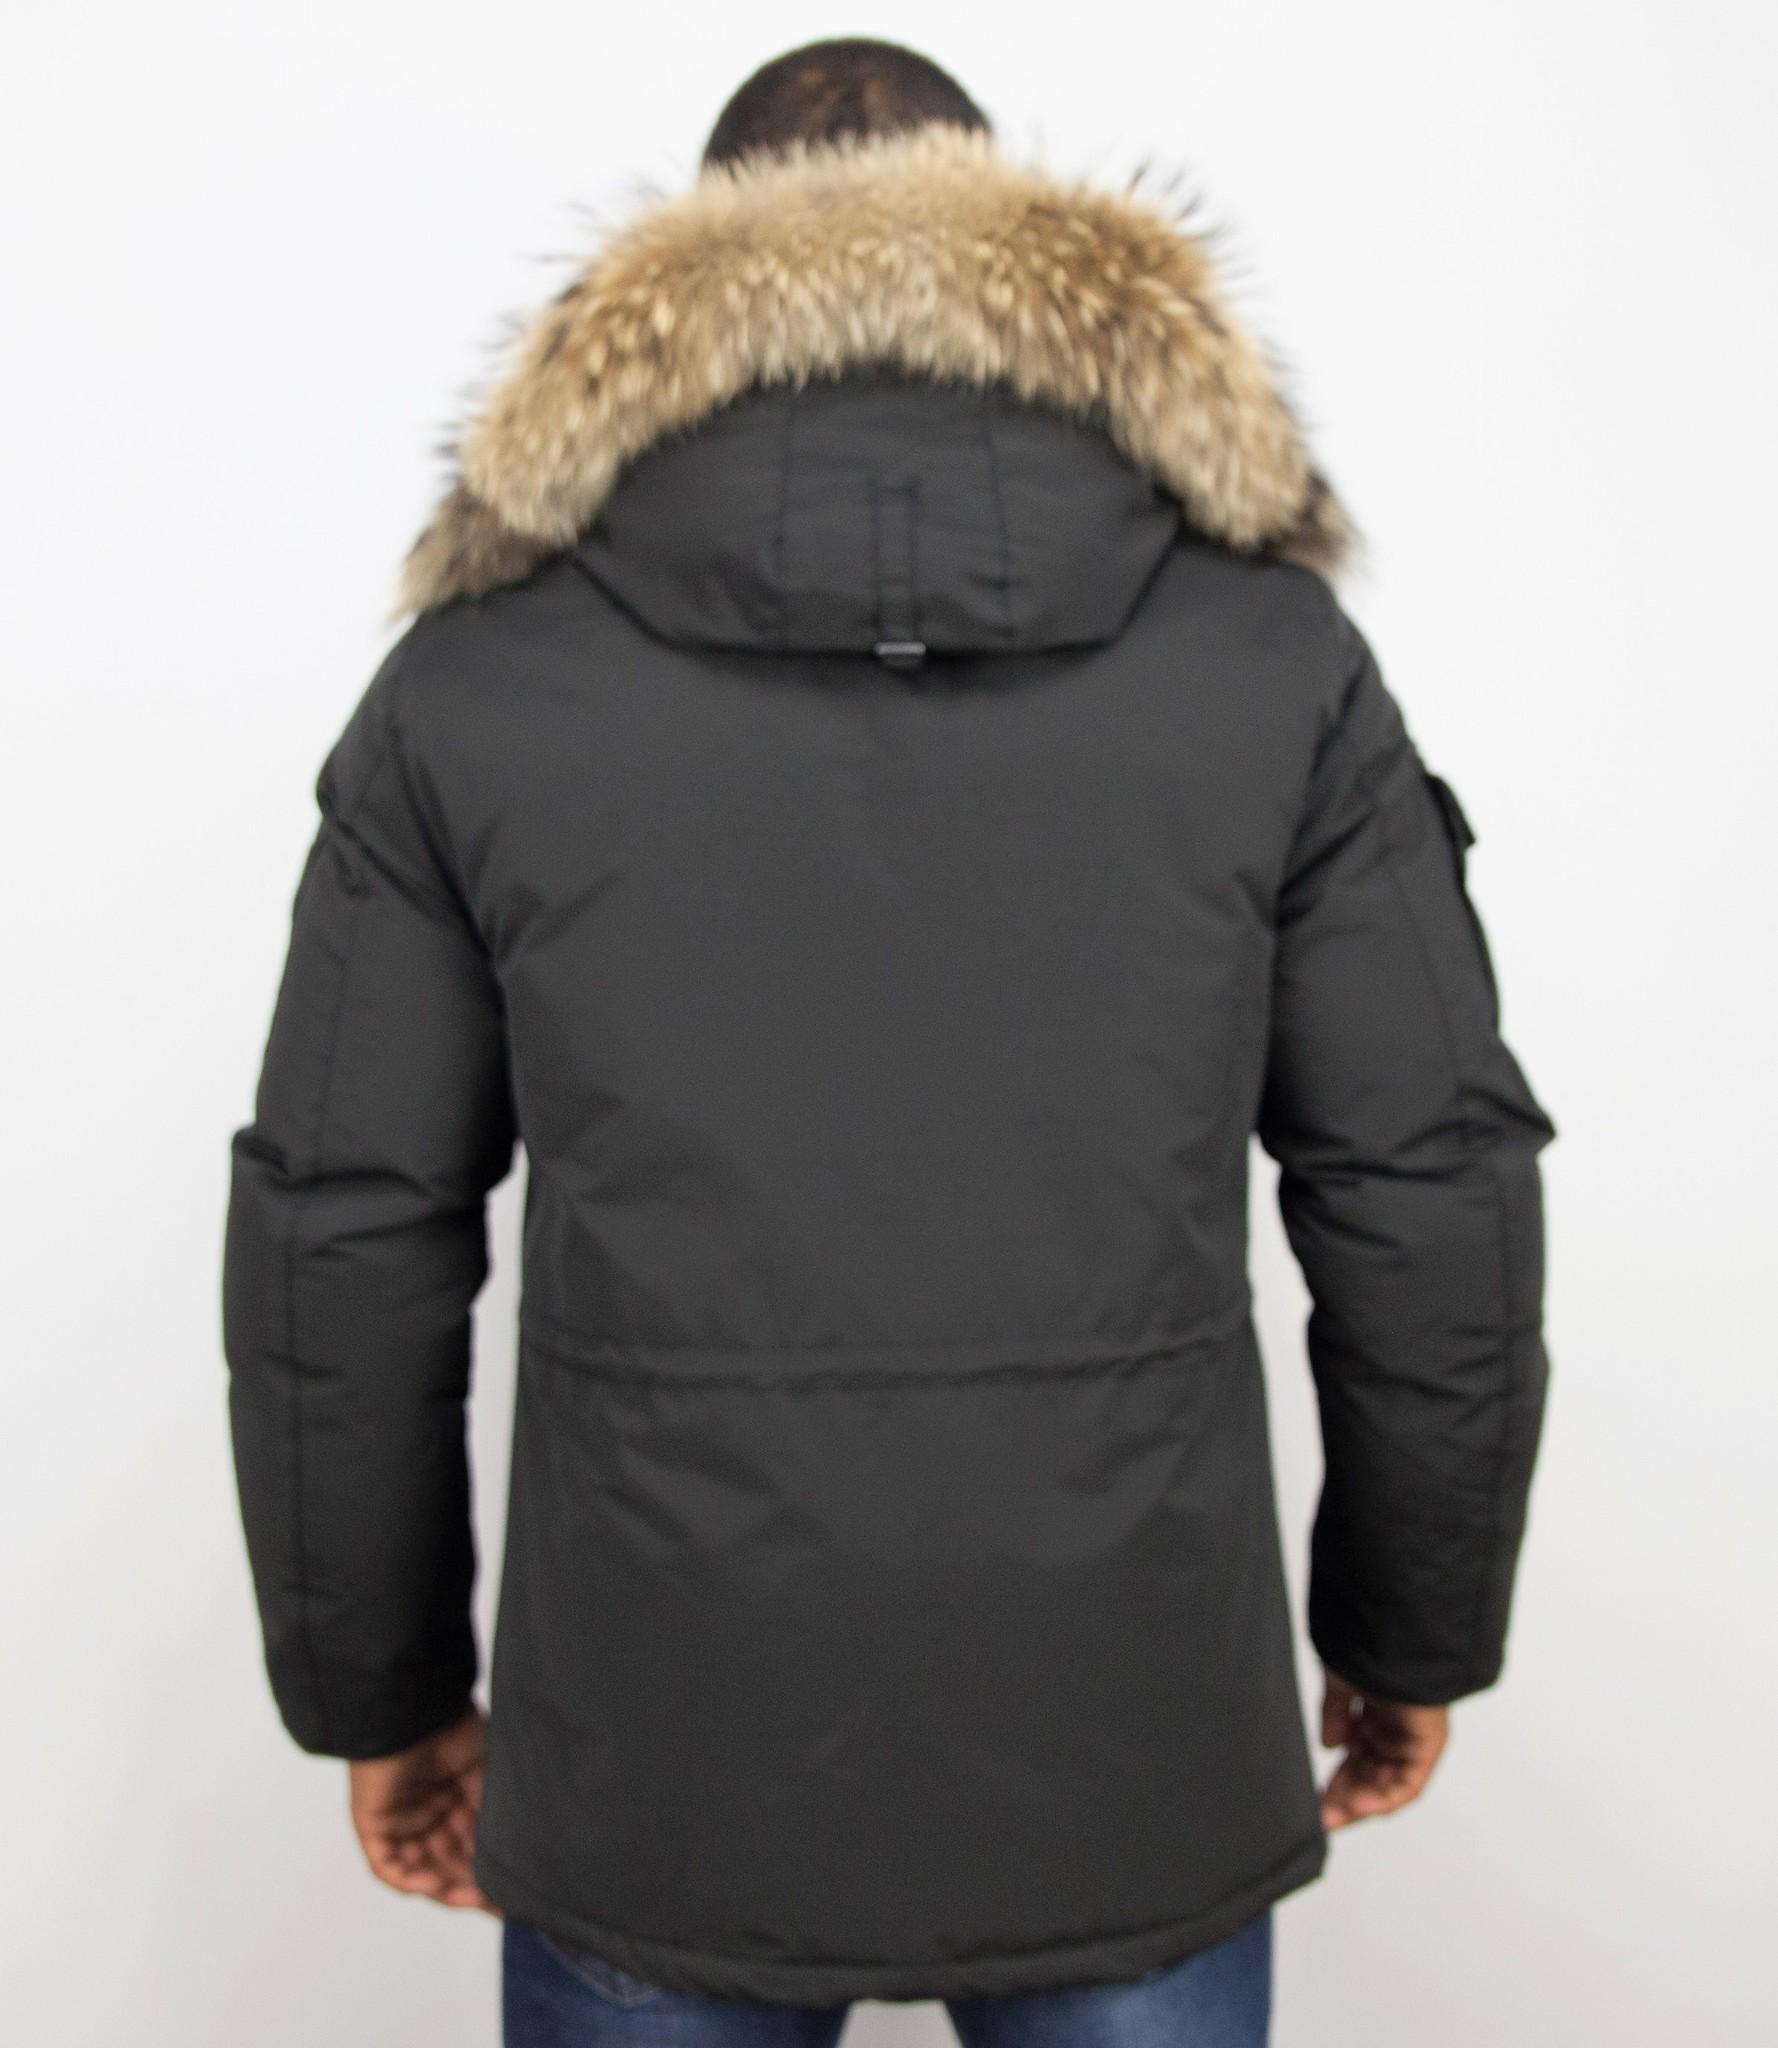 Mit Herren Jacken Lange Fellkragen Winterjacken TFlcK31J